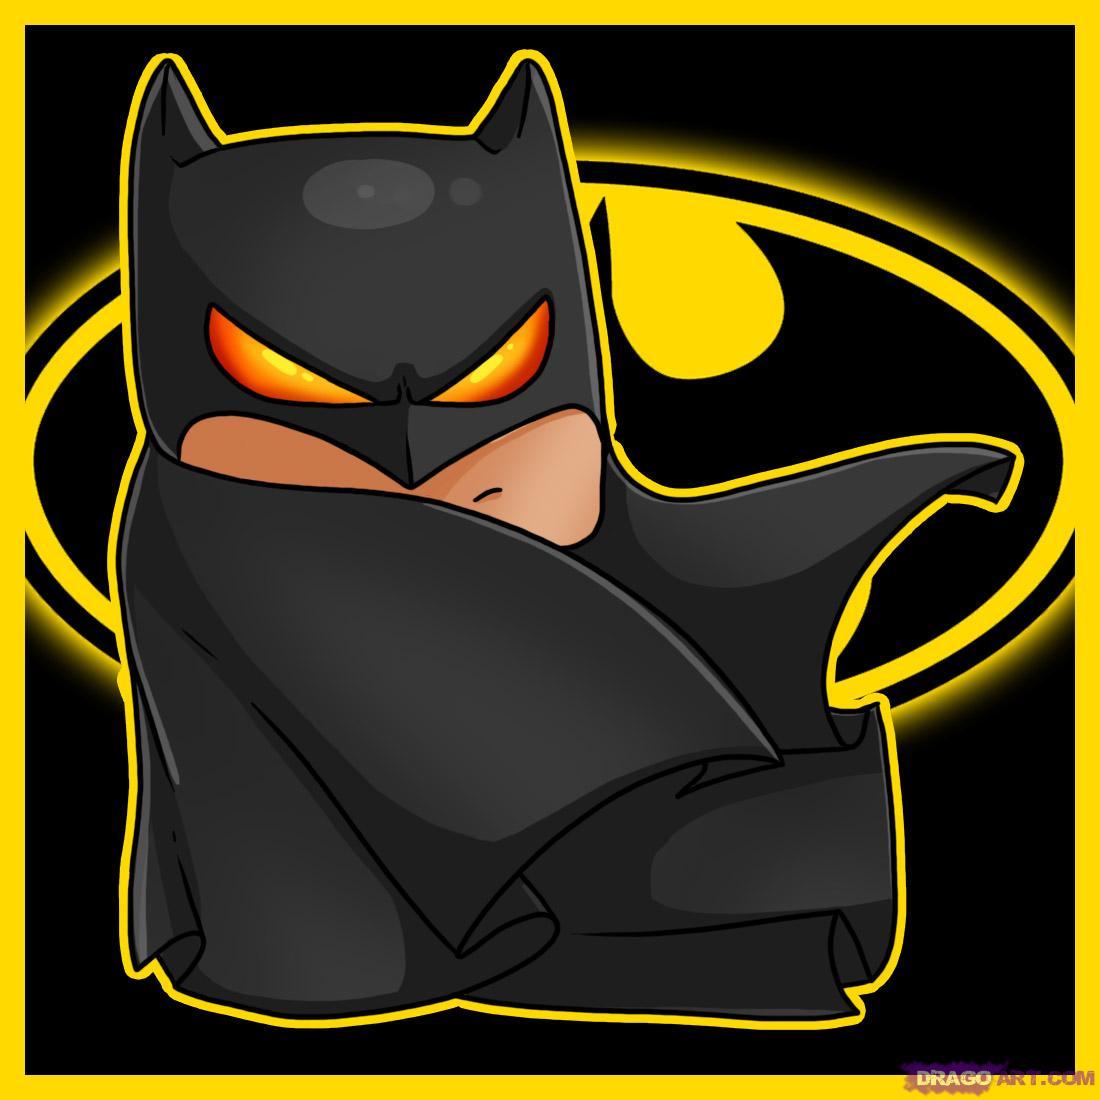 Drawn cute batman Batman chibi Chibis Draw Draw